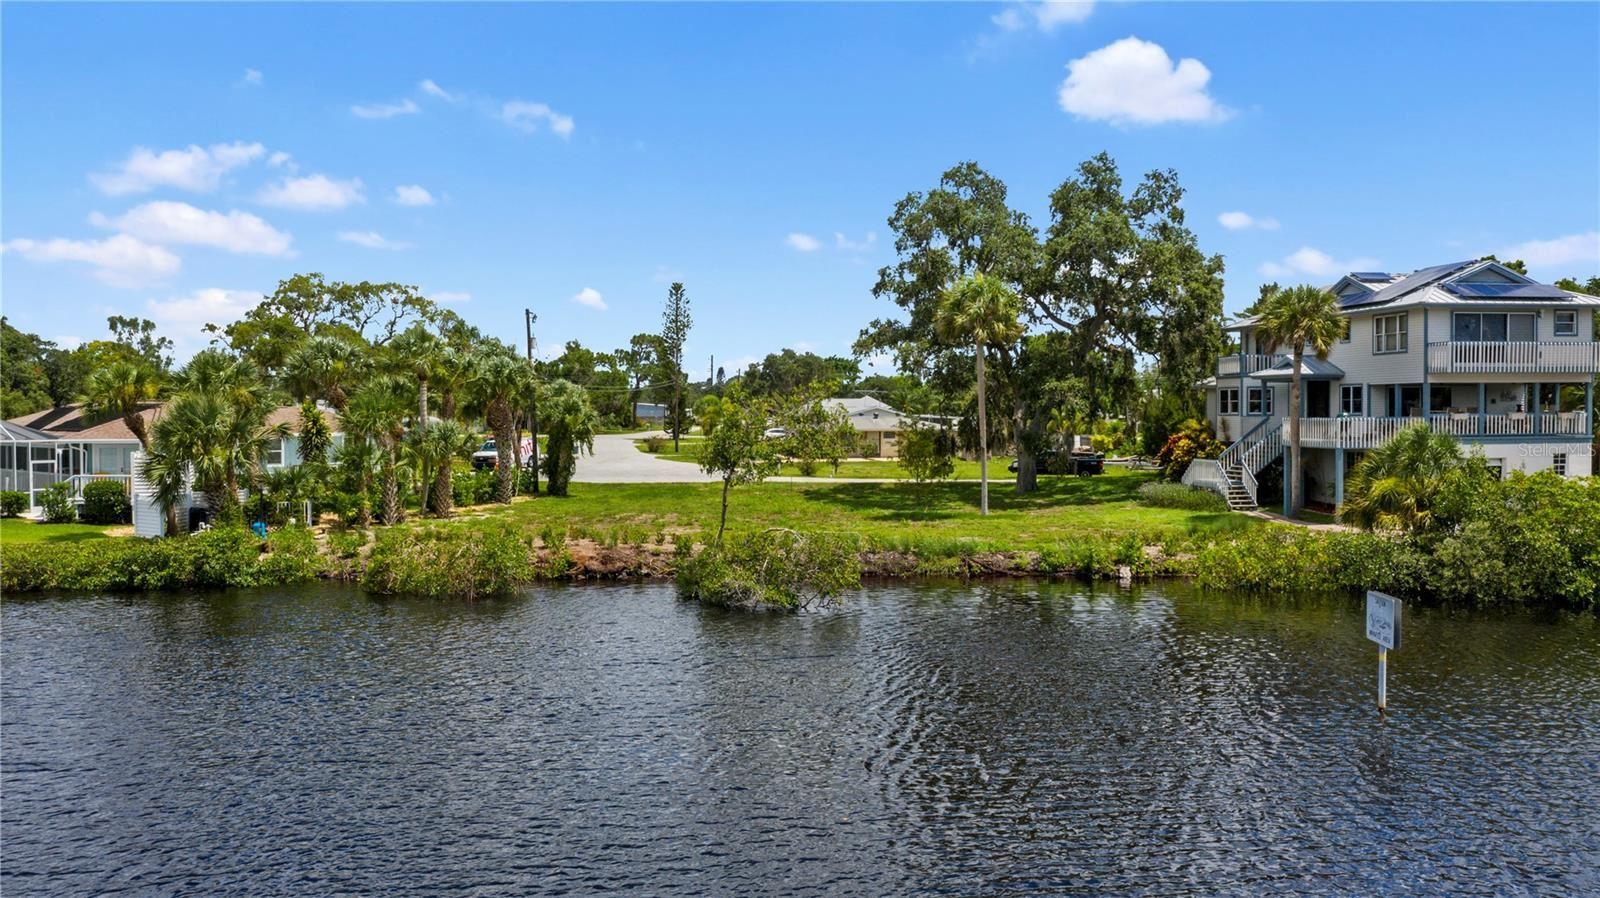 Photo of SUNCREST DRIVE, NOKOMIS, FL 34275 (MLS # A4506434)